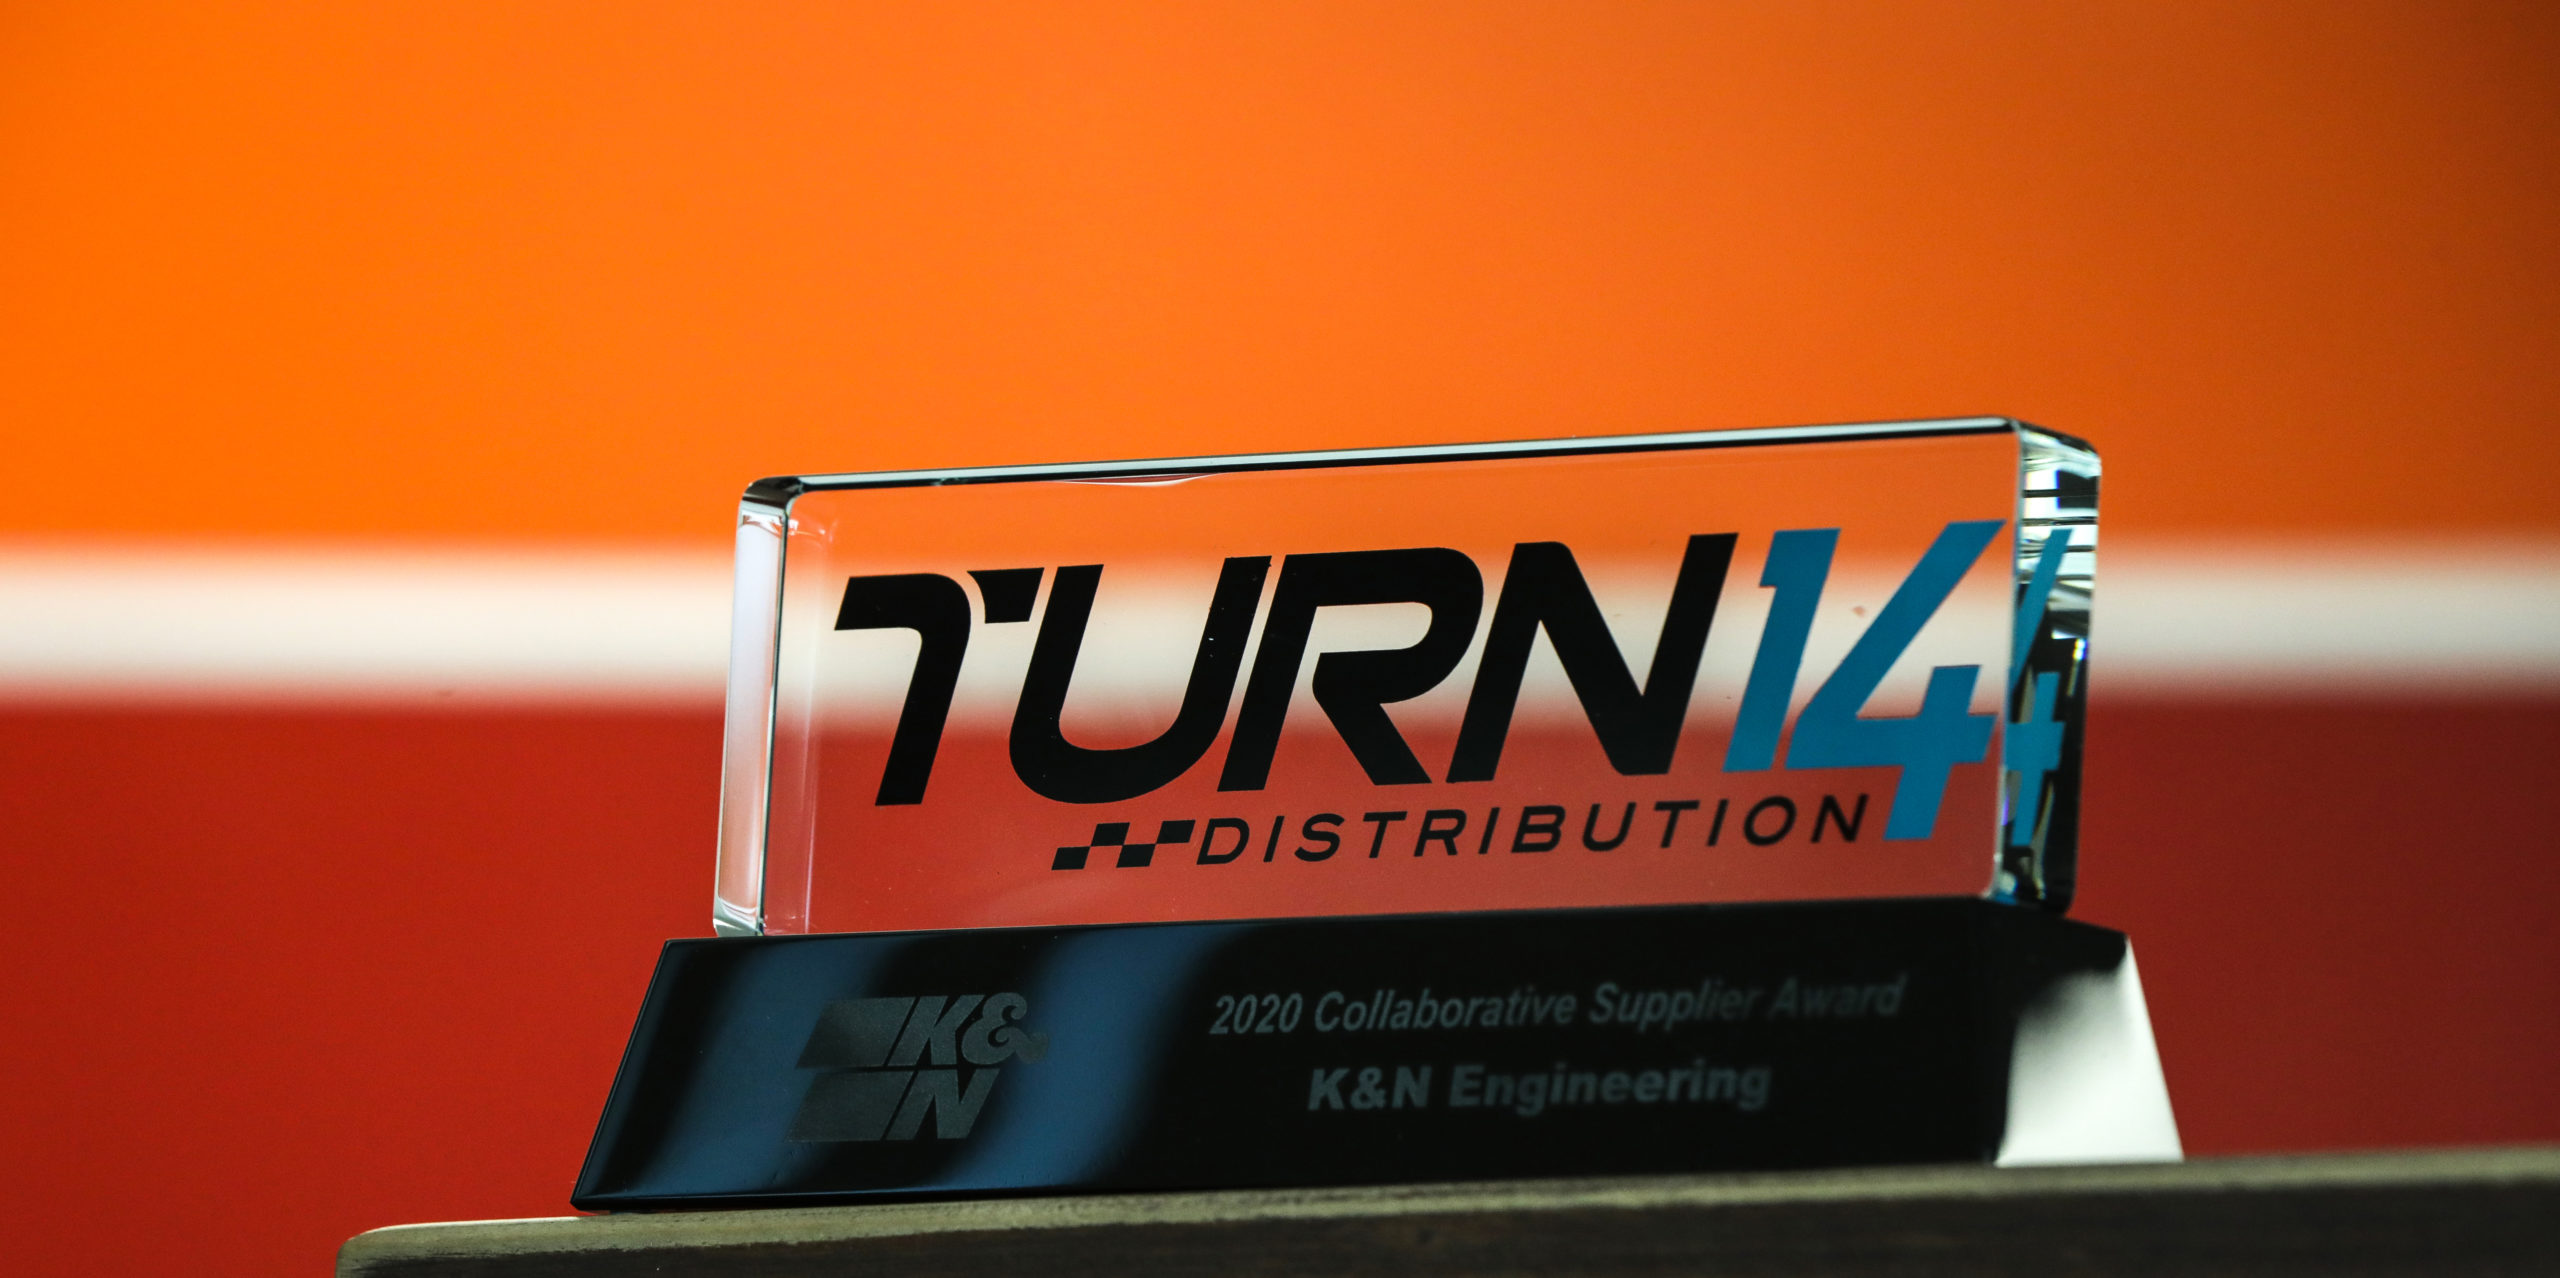 racing performance award supplier